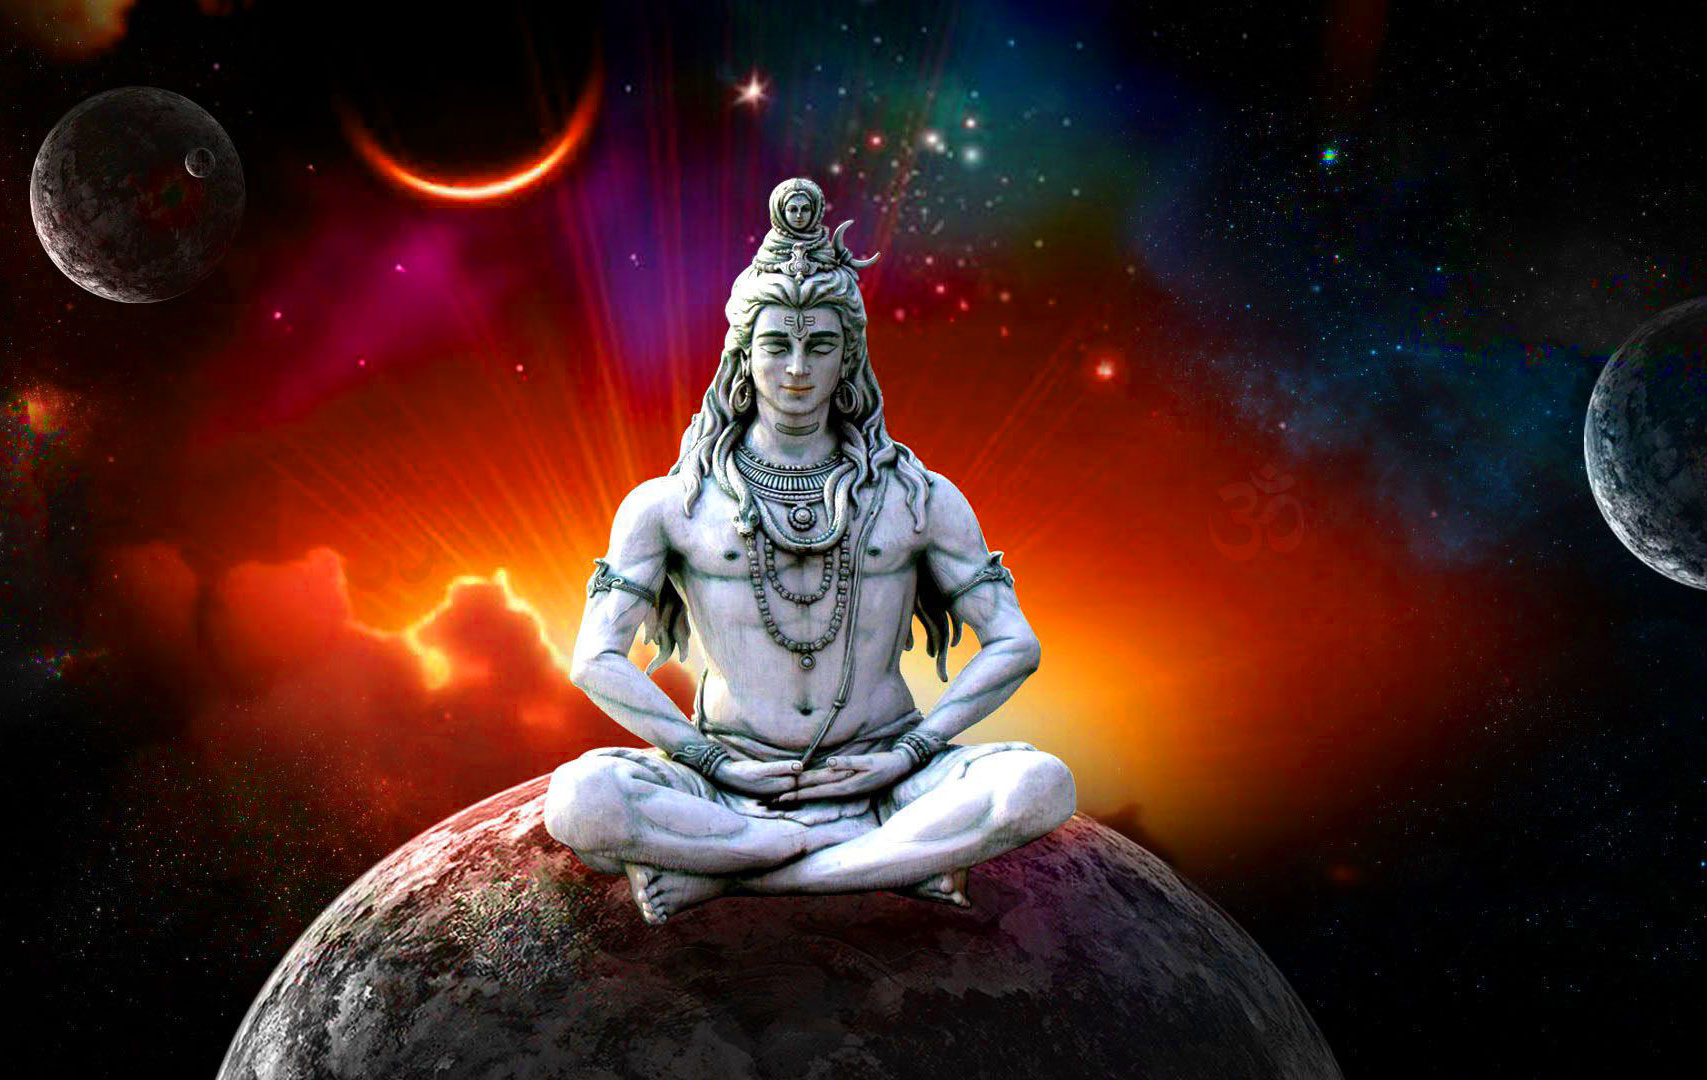 Shiva Images pics photo hd